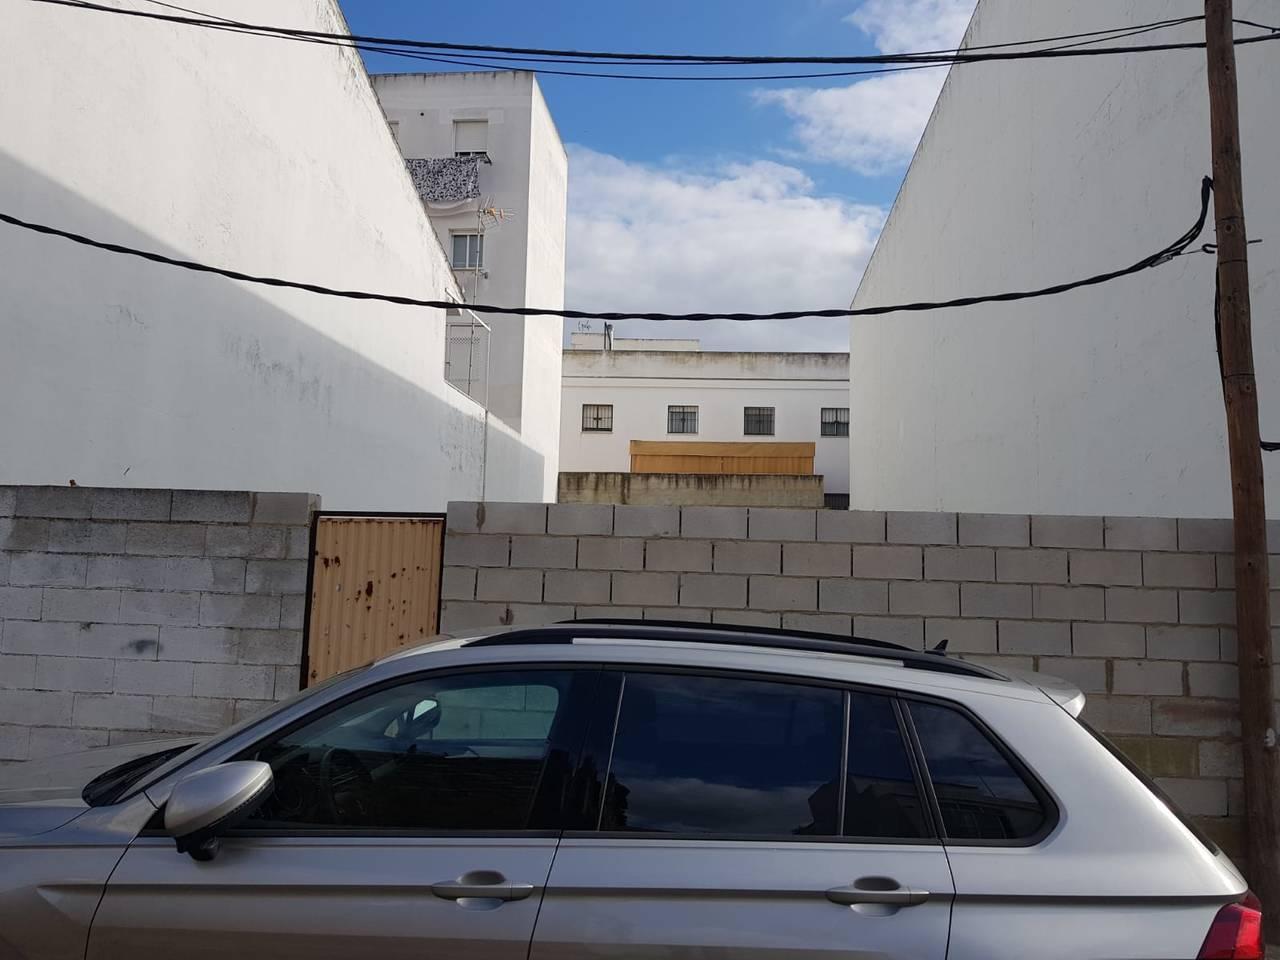 Venta solar en Huelva.  - Foto 2